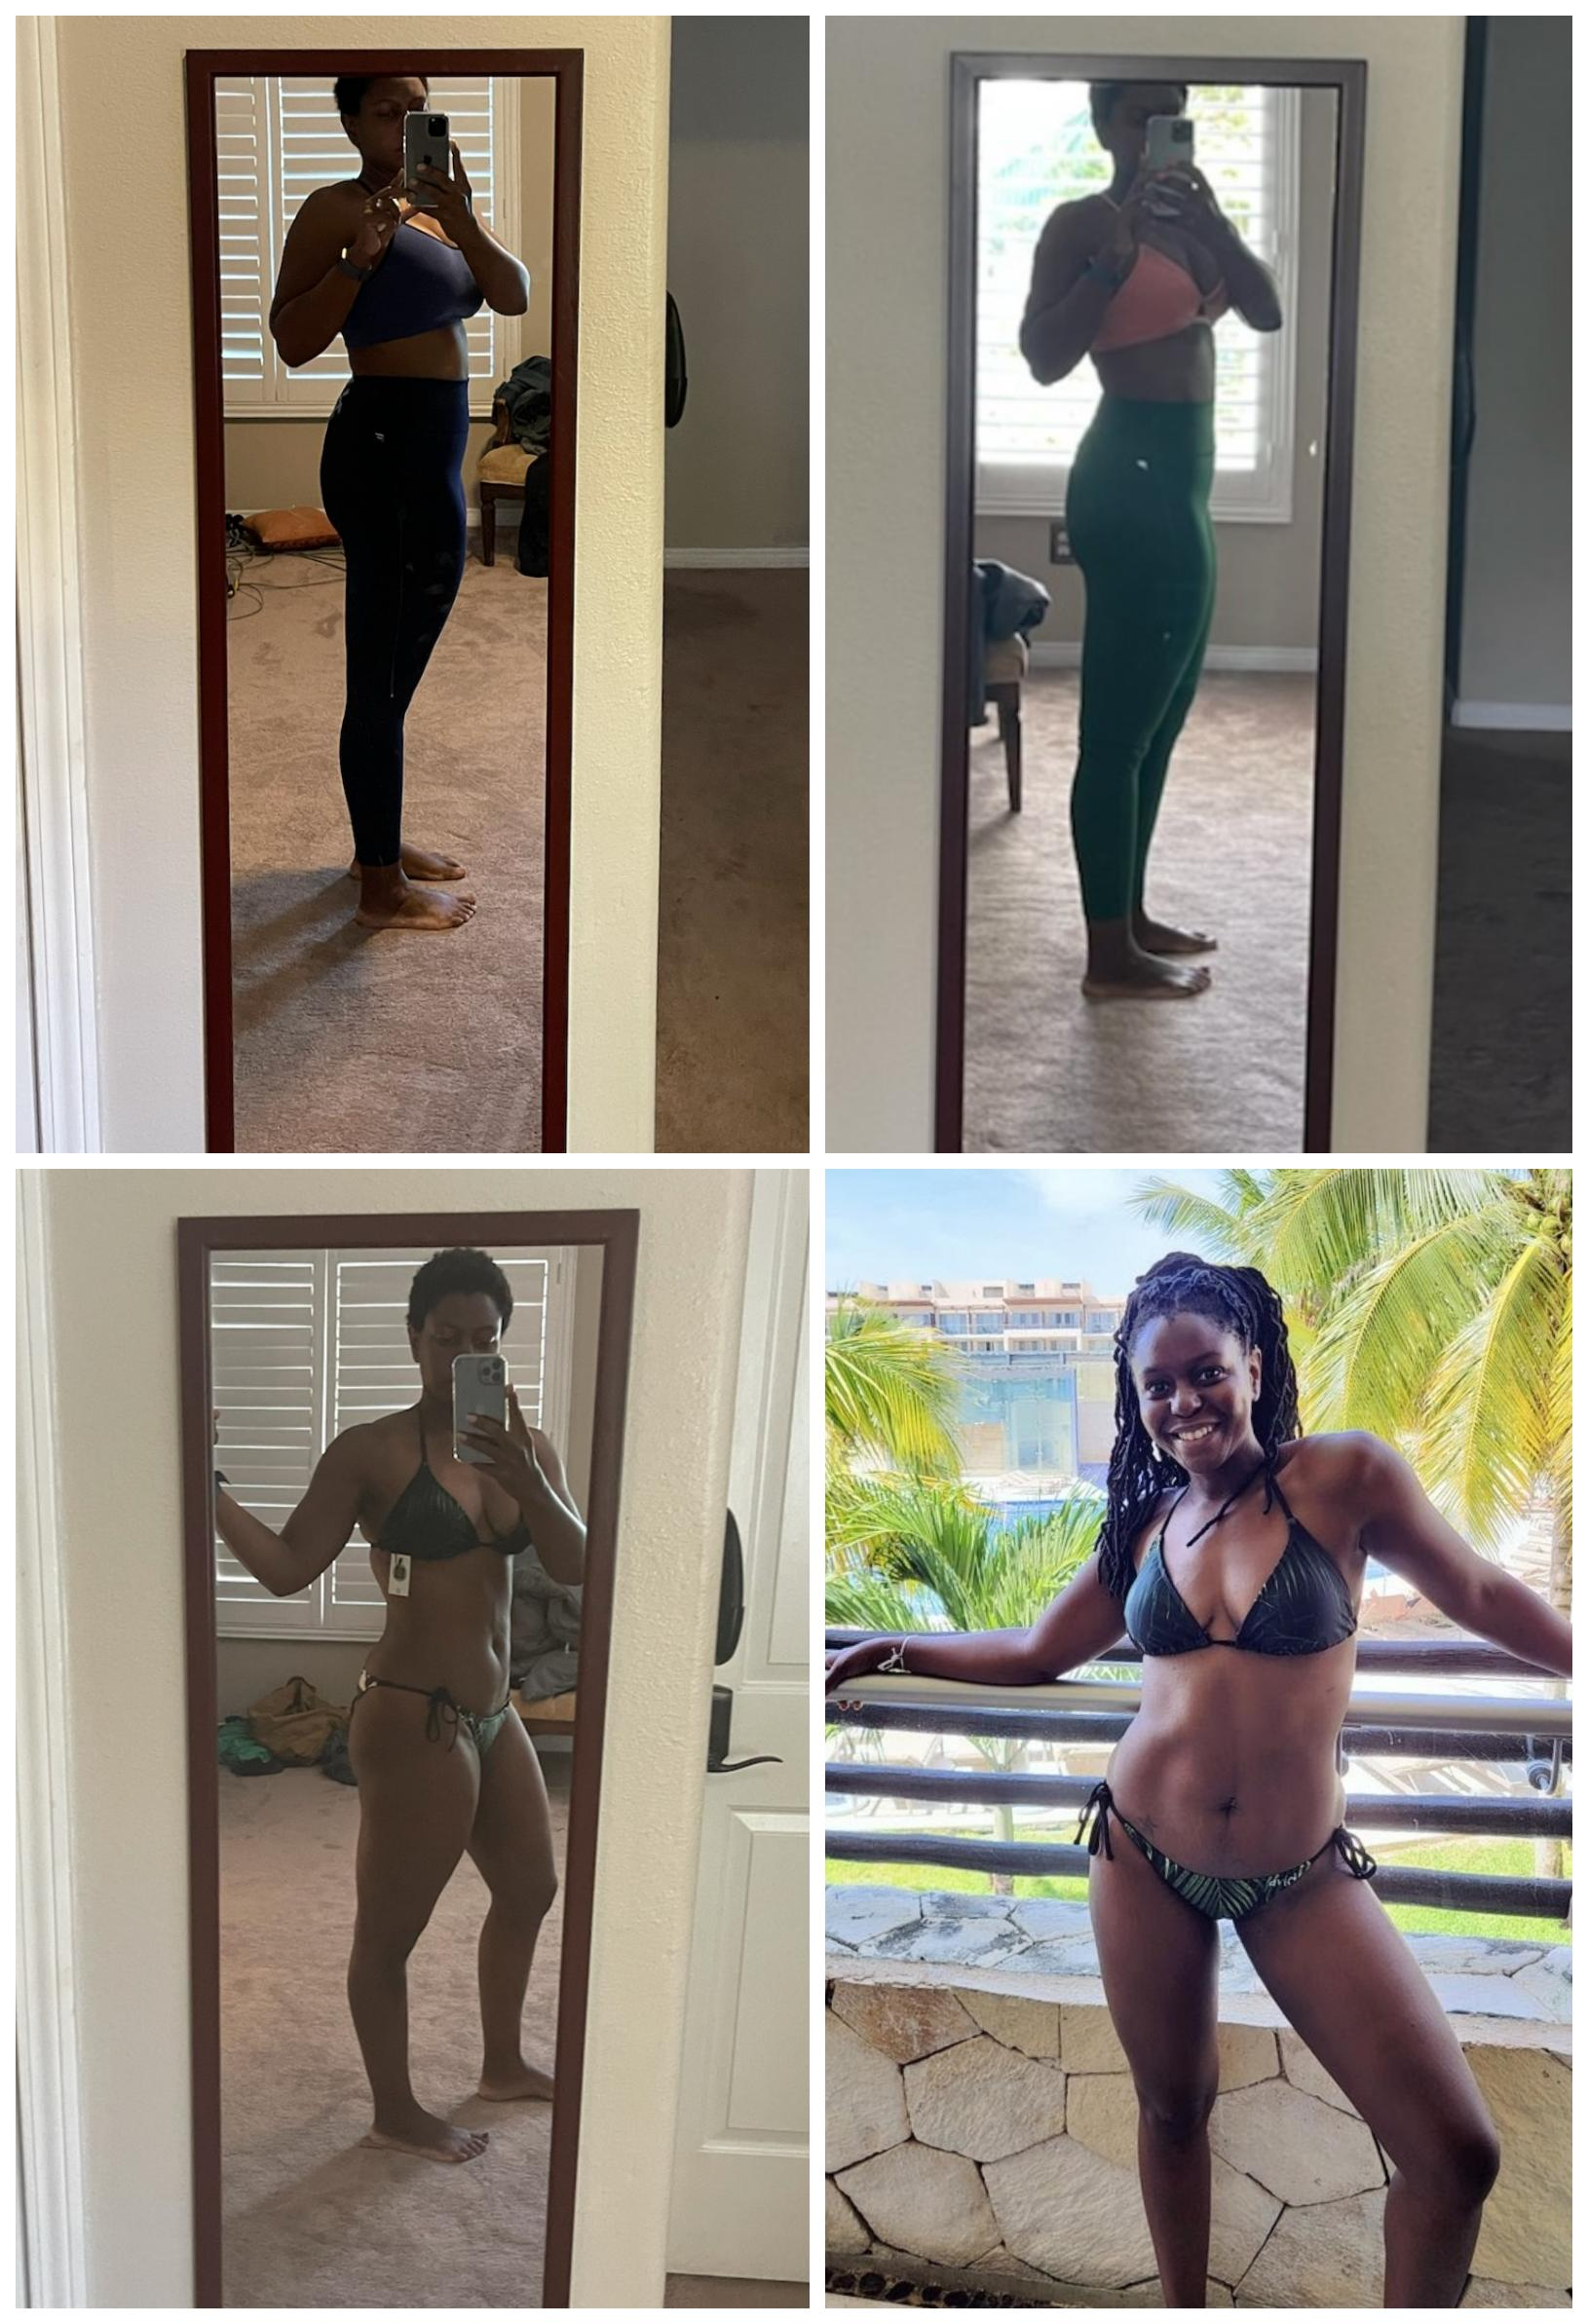 5'7 Female Progress Pics of 30 lbs Weight Loss 186 lbs to 156 lbs